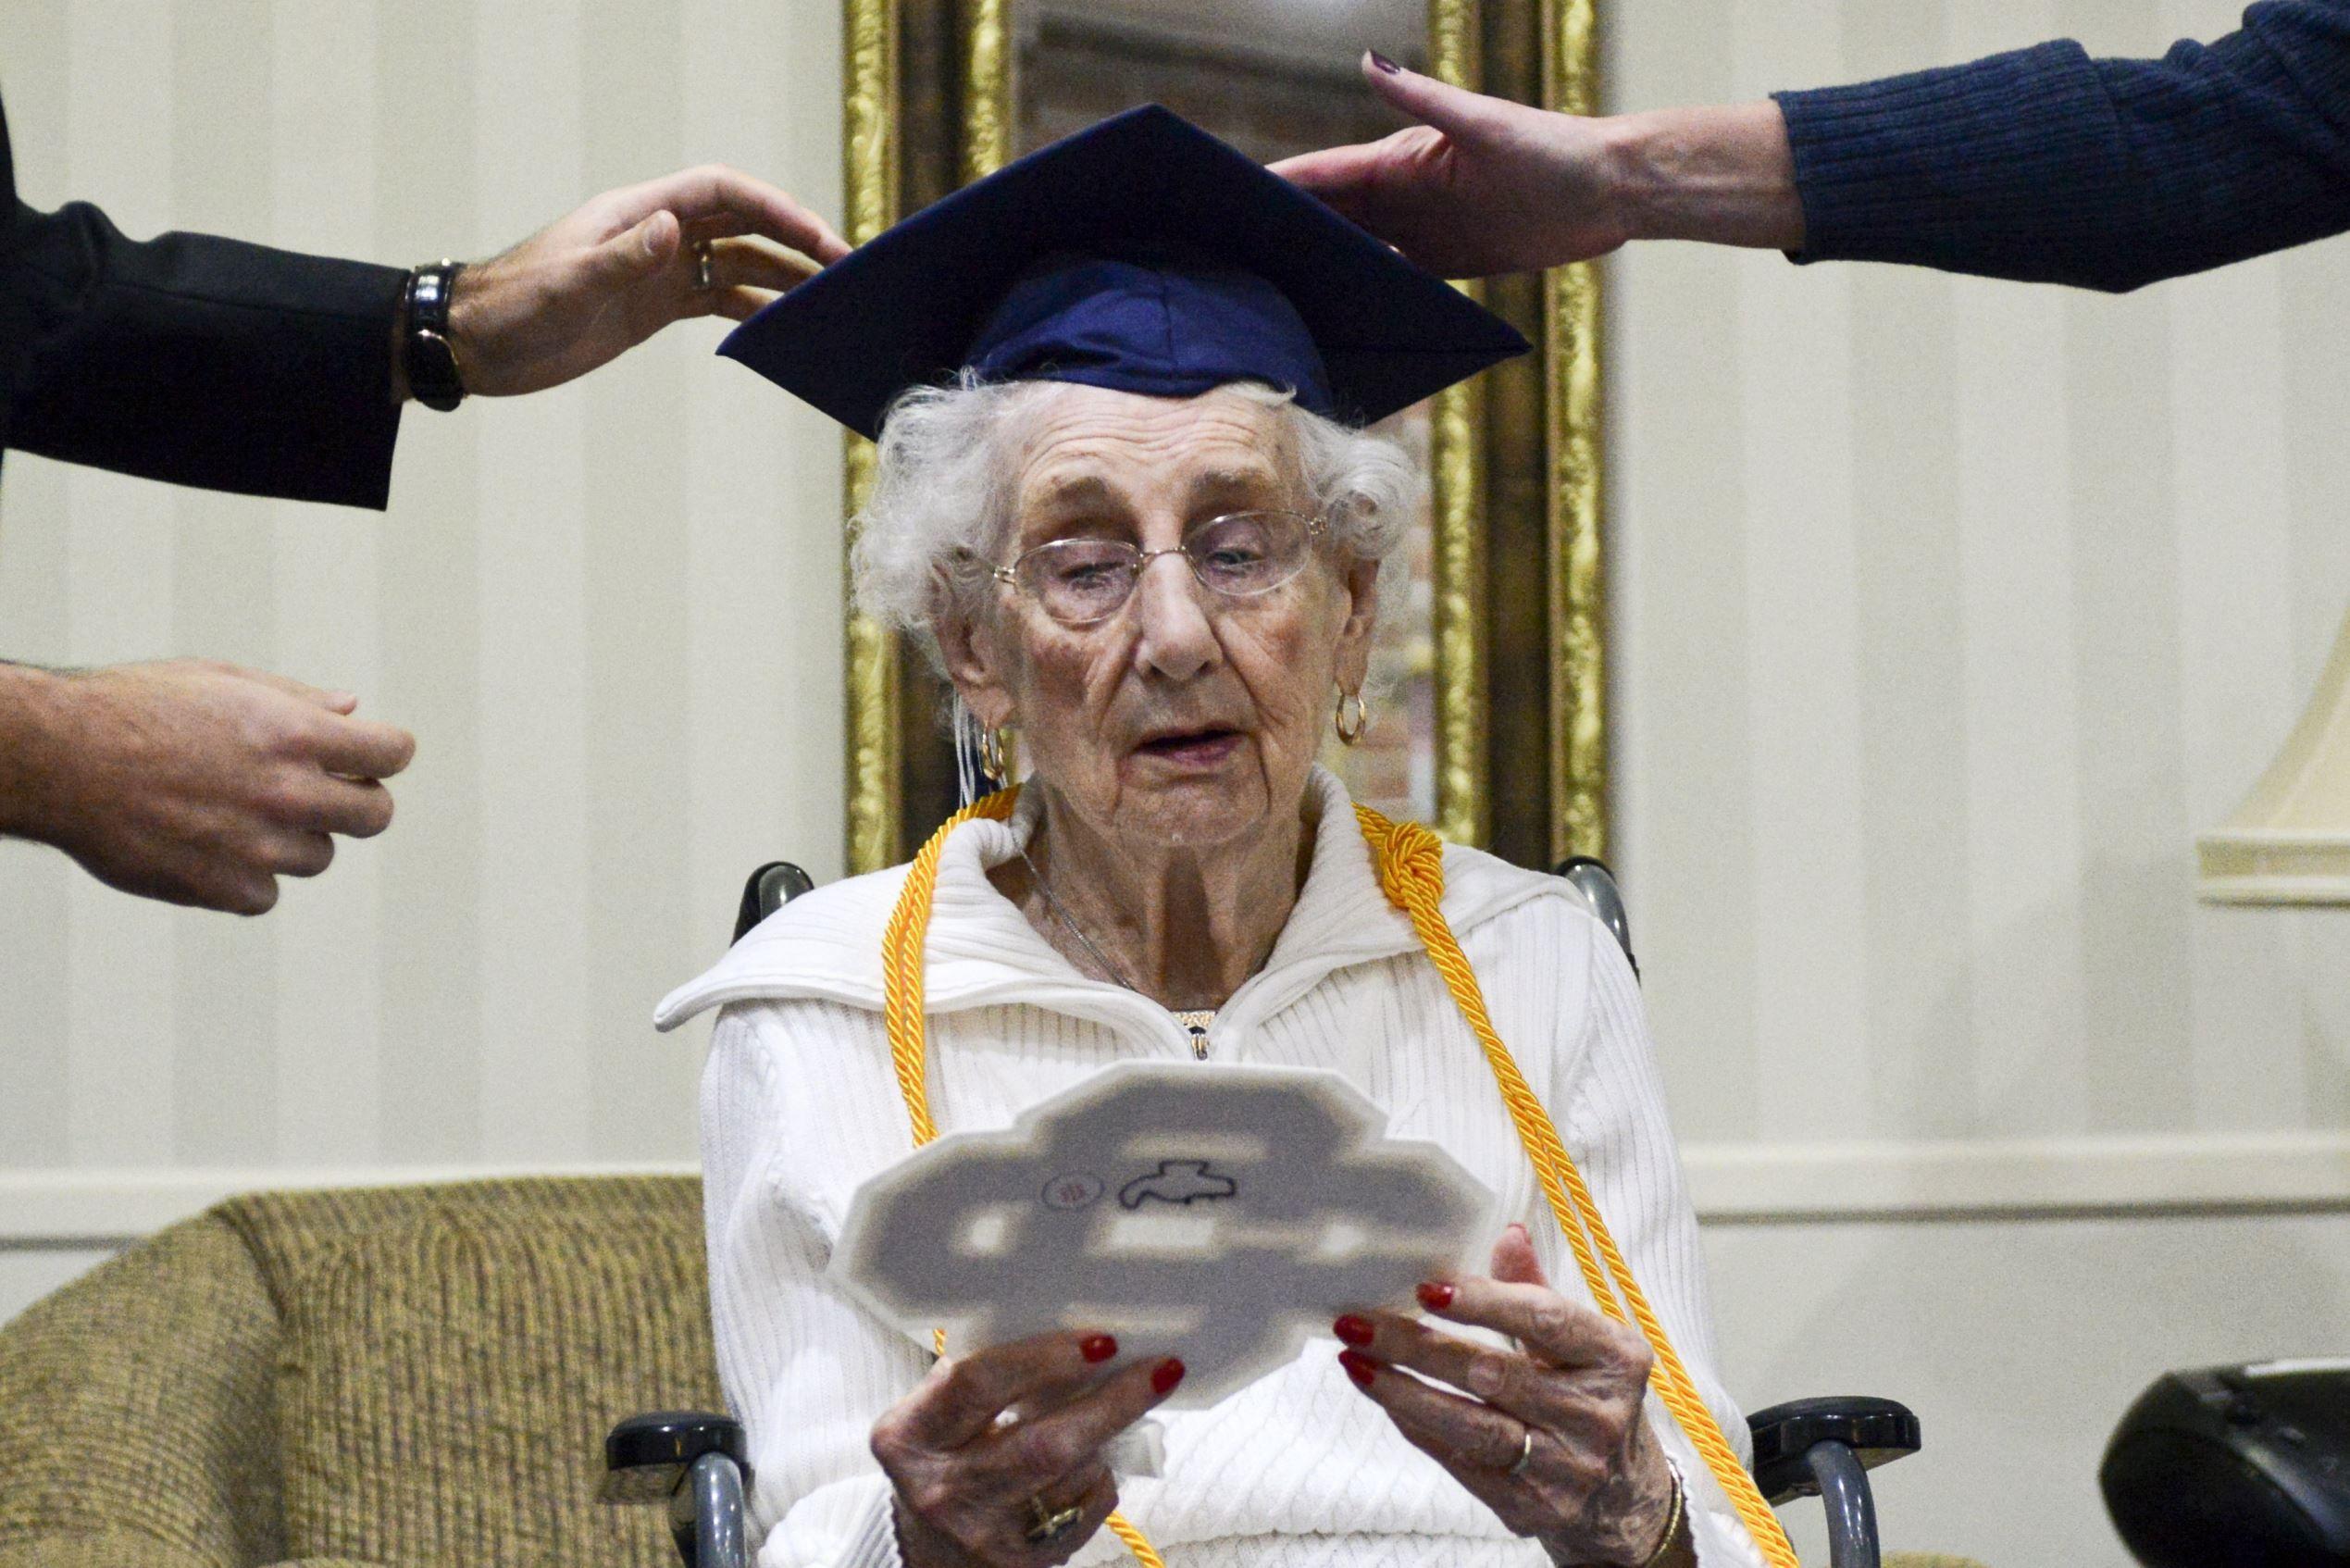 97yearold michigan woman receives high school diploma